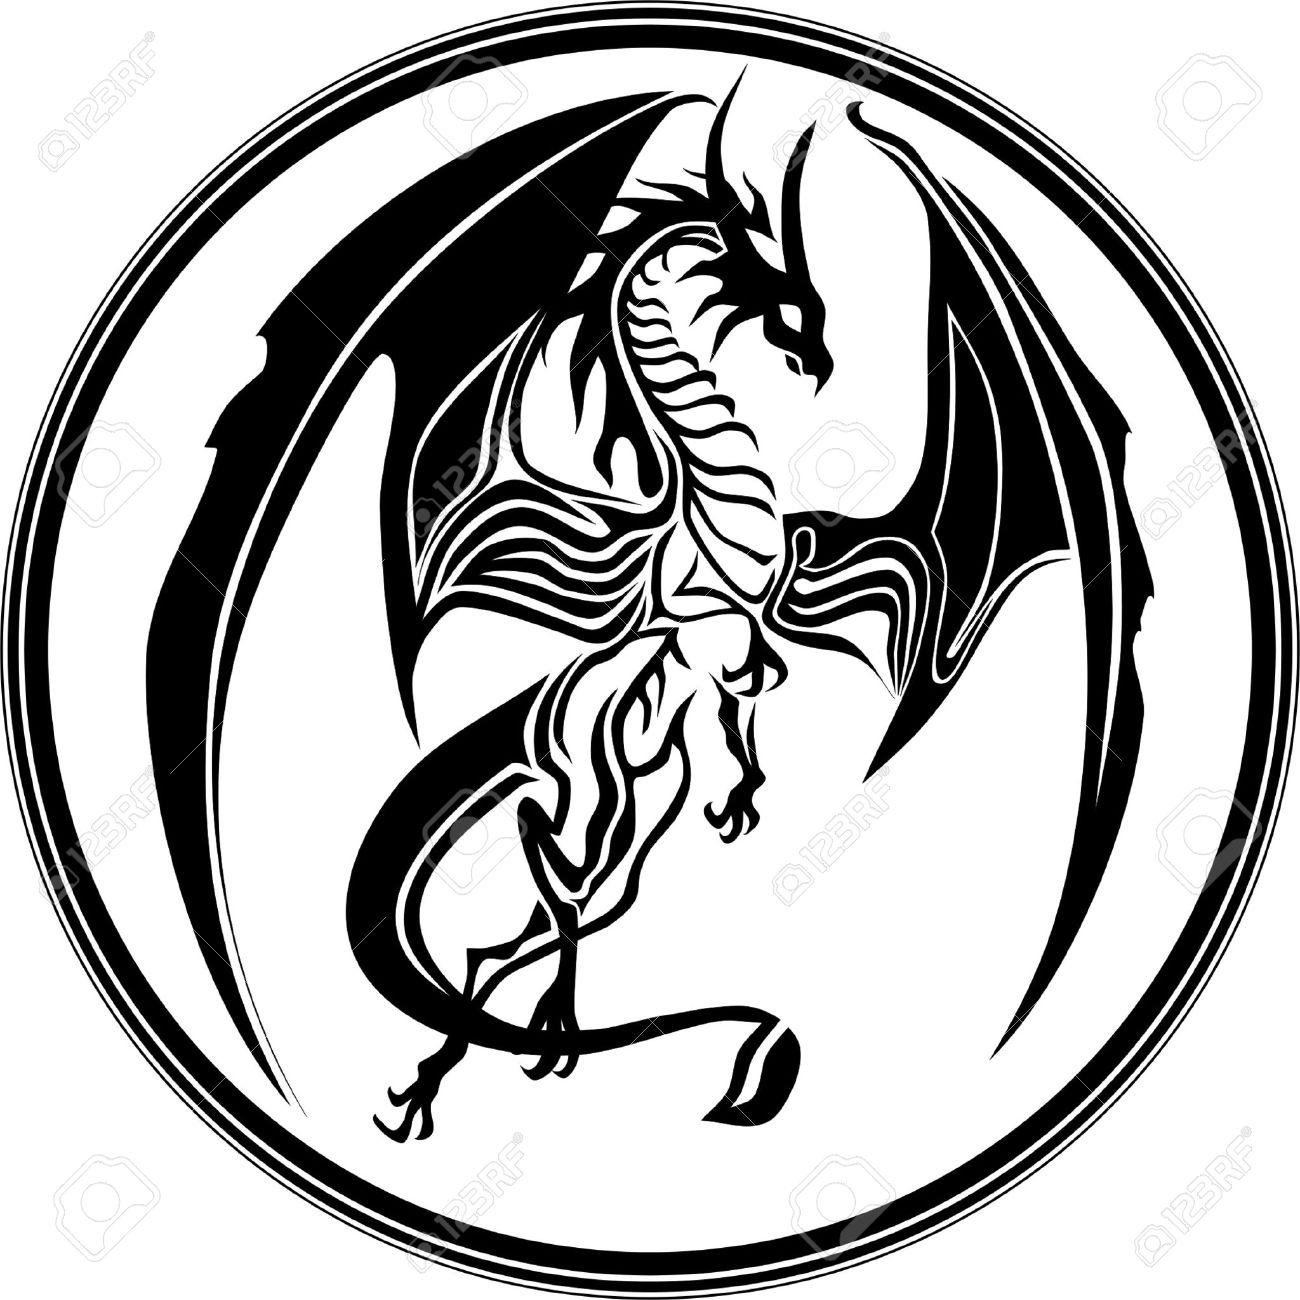 Dragon Tribal wie Standard-Bild - 12802721